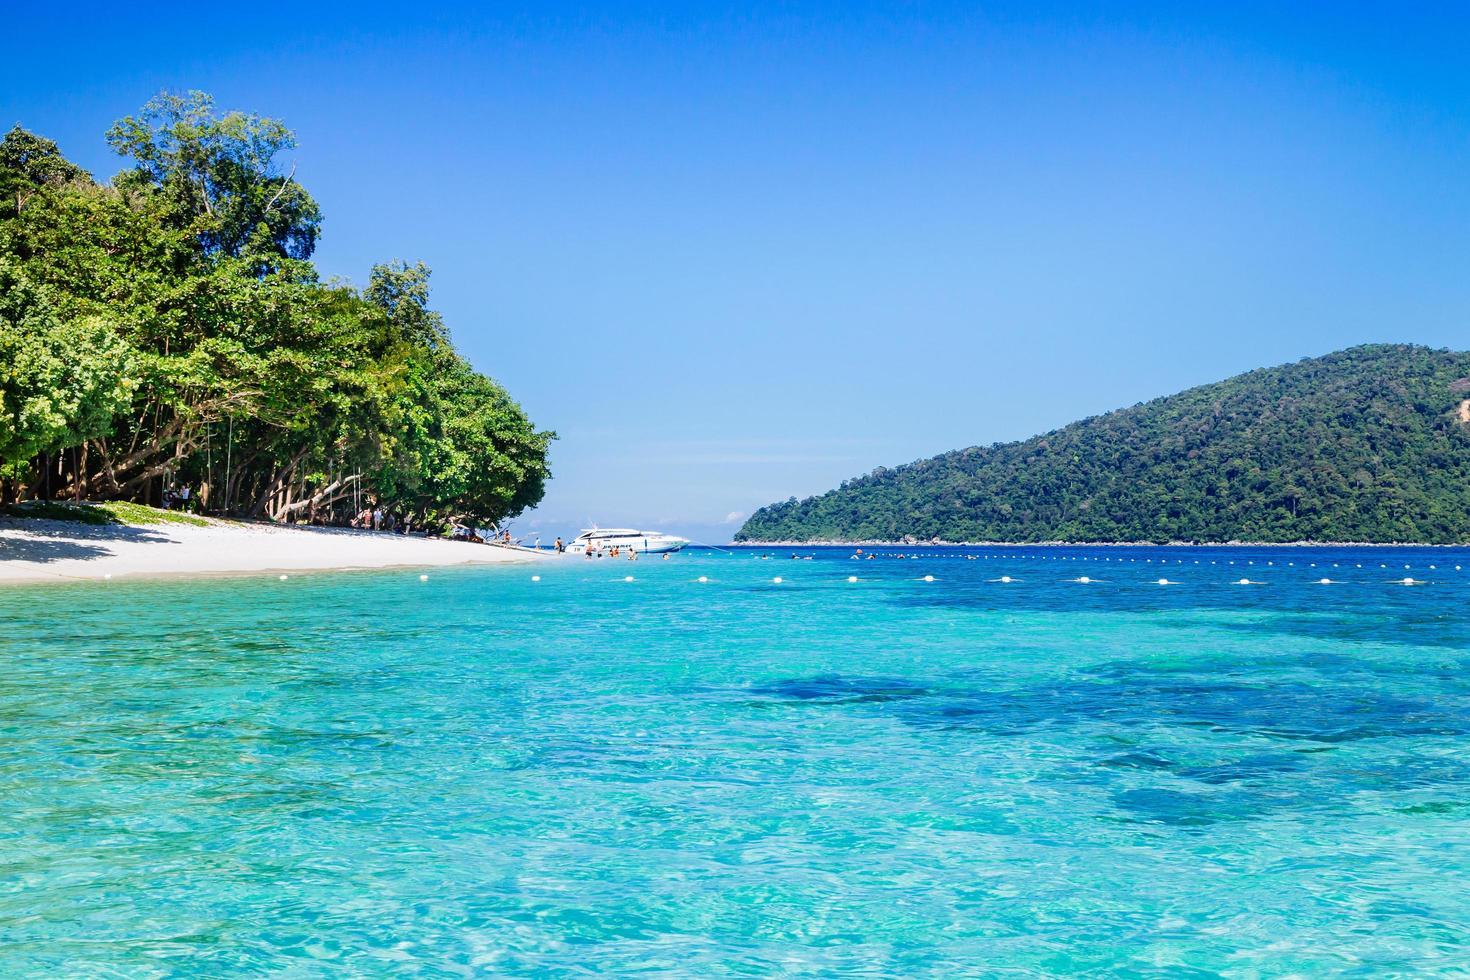 vacker sommarstrand. lipe island, koh lipe, satunprovinsen thailand foto